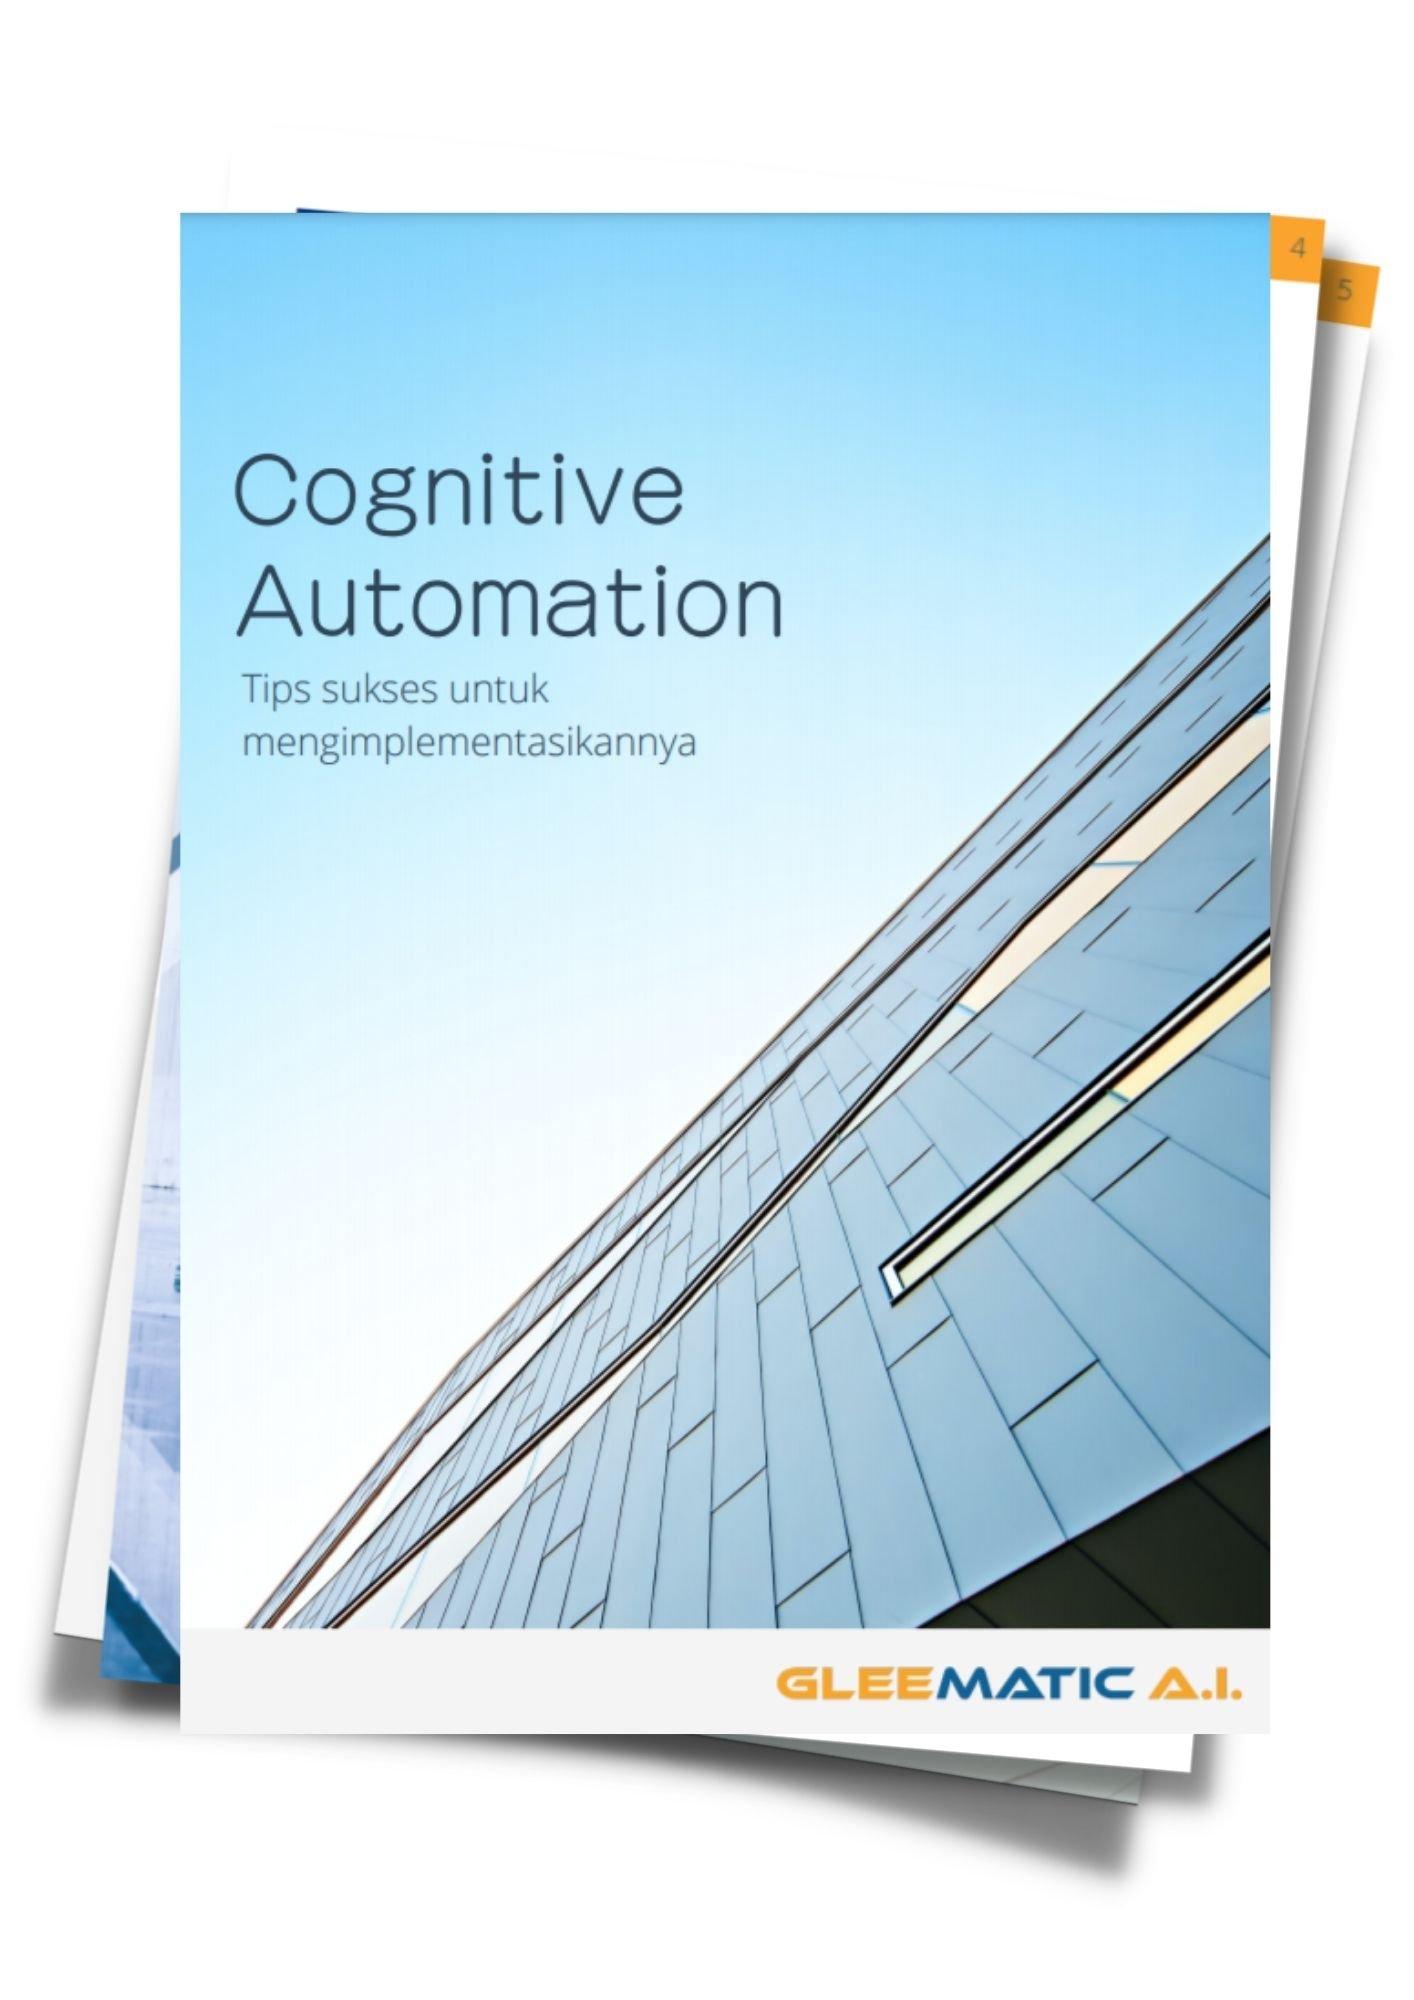 Apa itu Cognitive Automation (Otomatisasi dalam Komputer)?